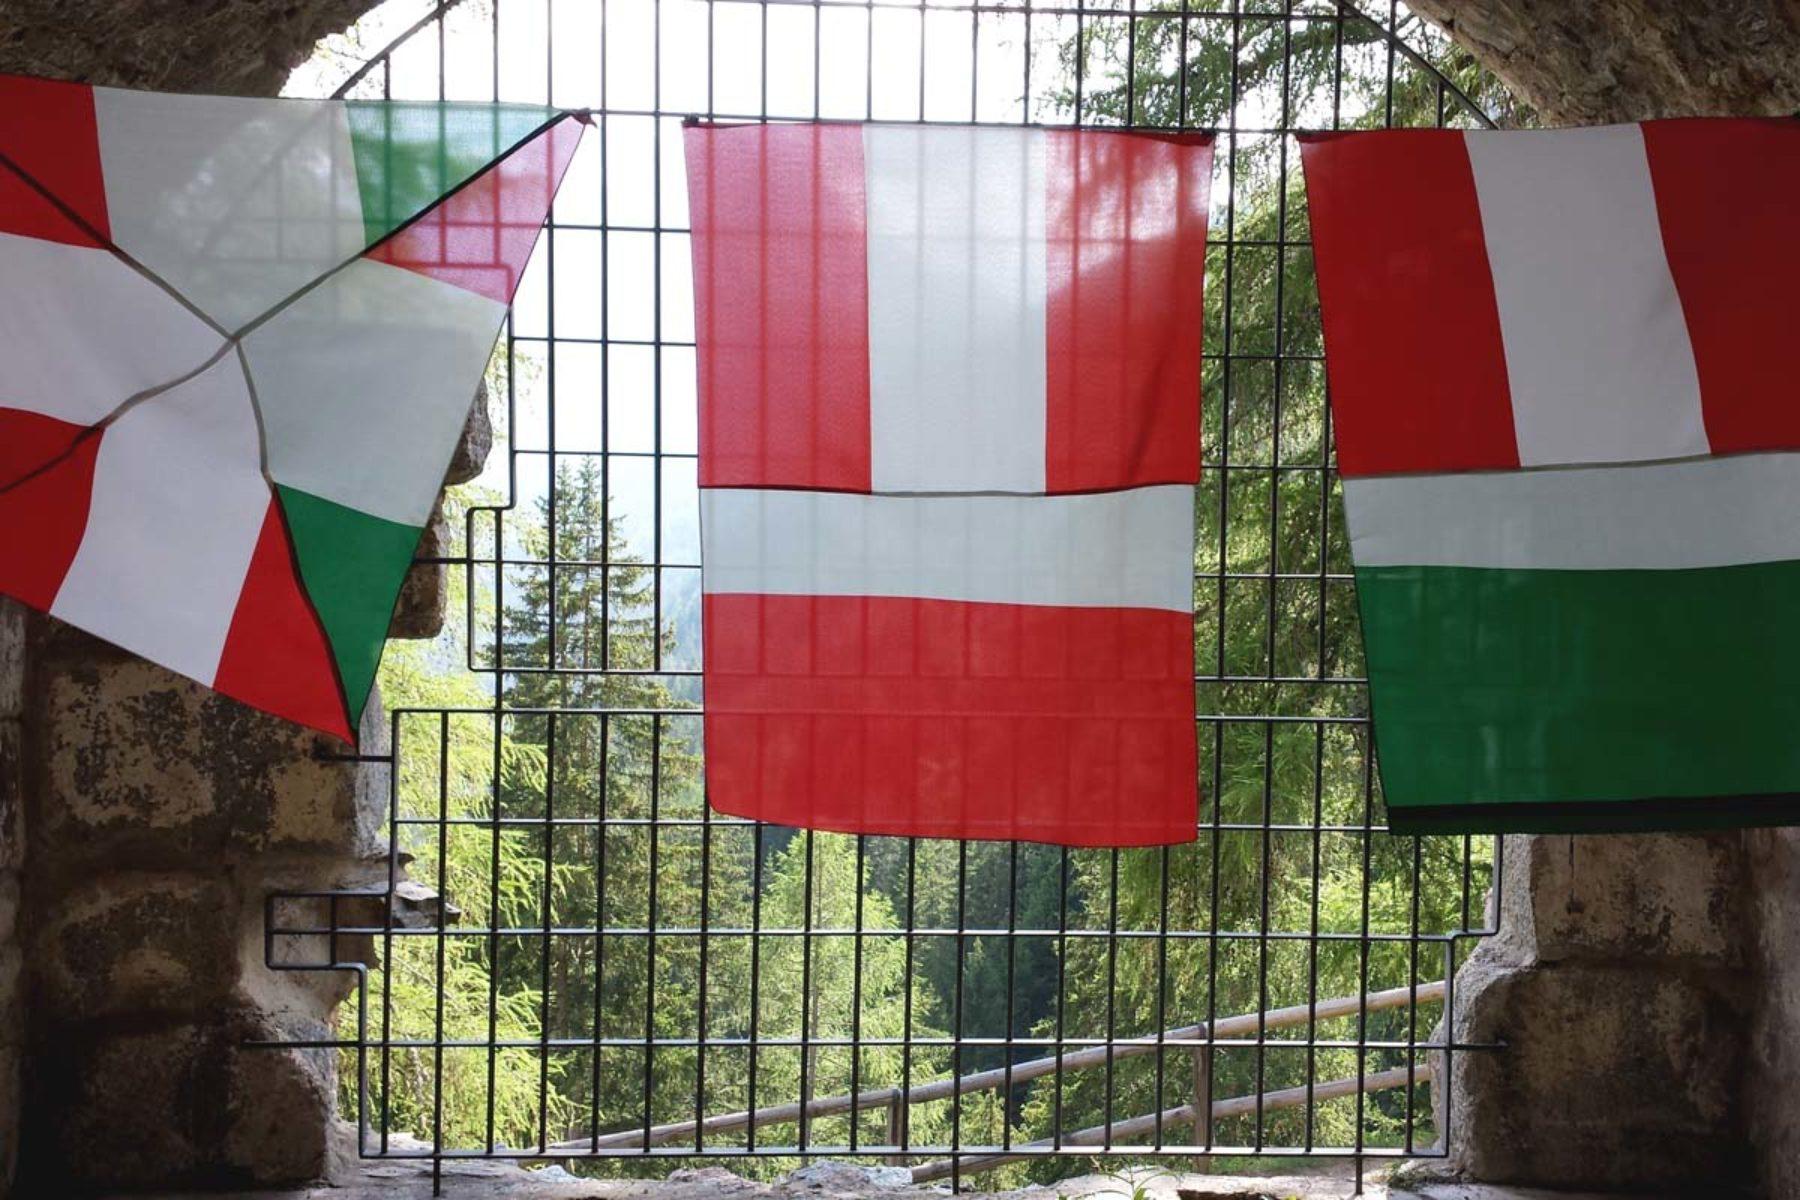 F. Lanaro, IT_A, 2013, sewn flags, installation view, 2